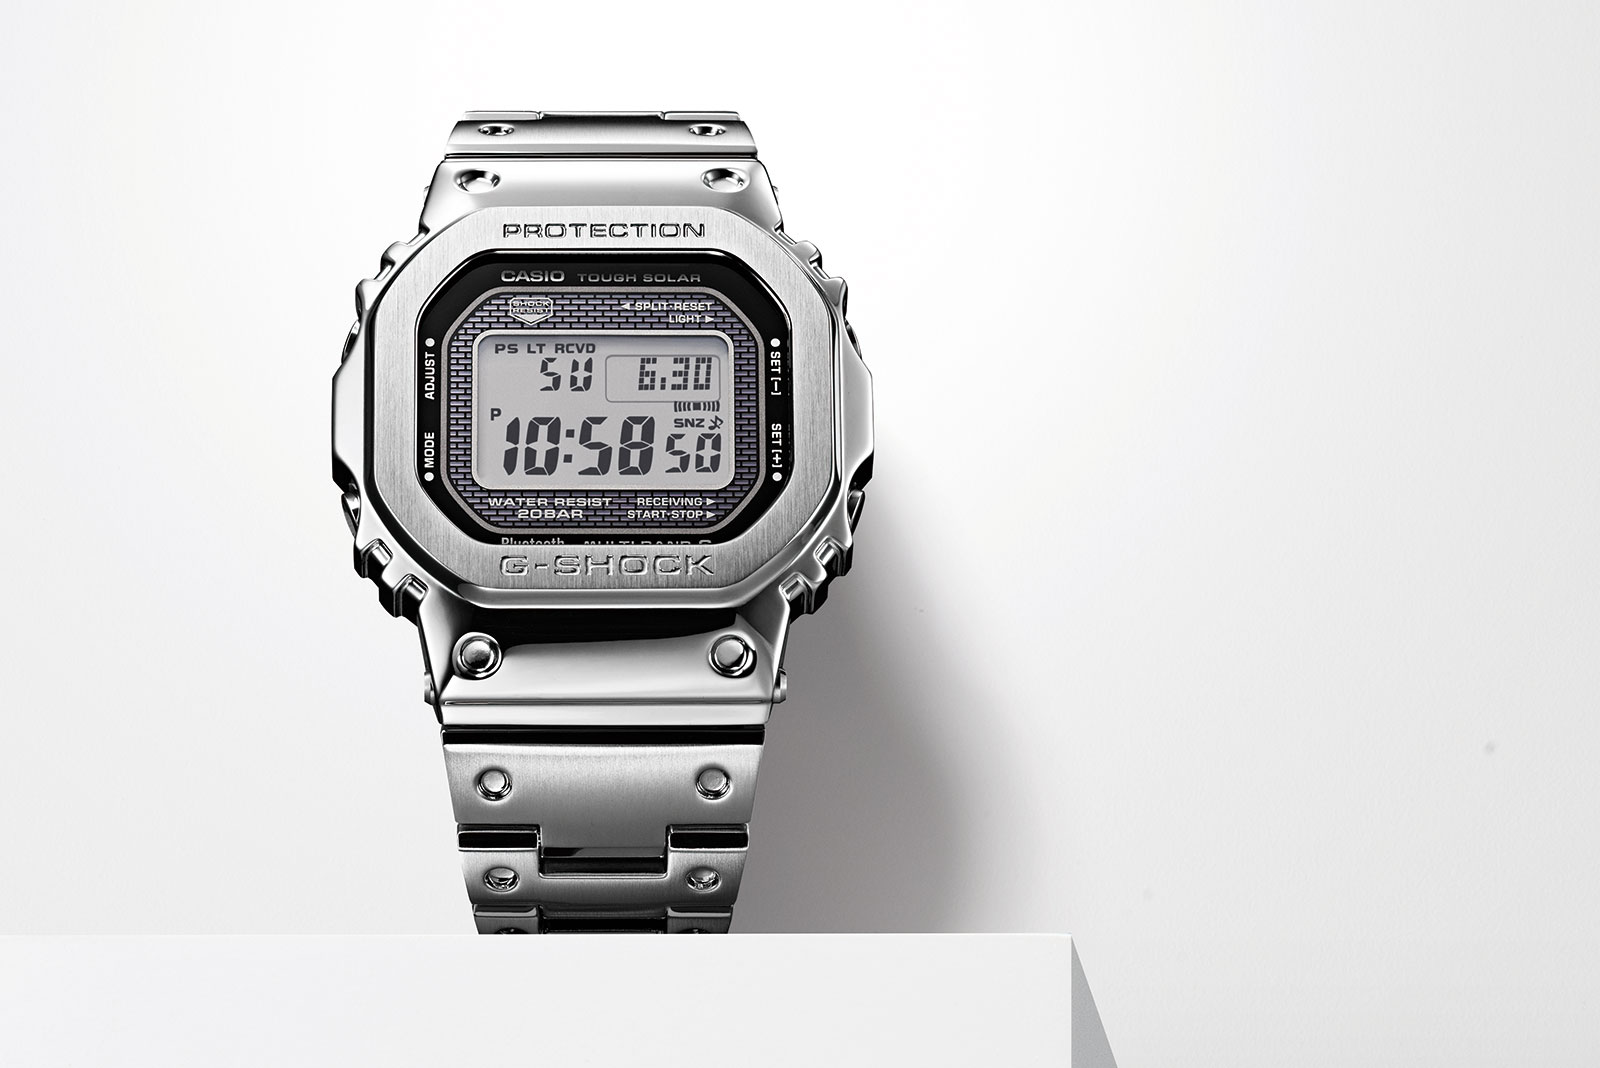 G-Shock GMW-B5000D all steel